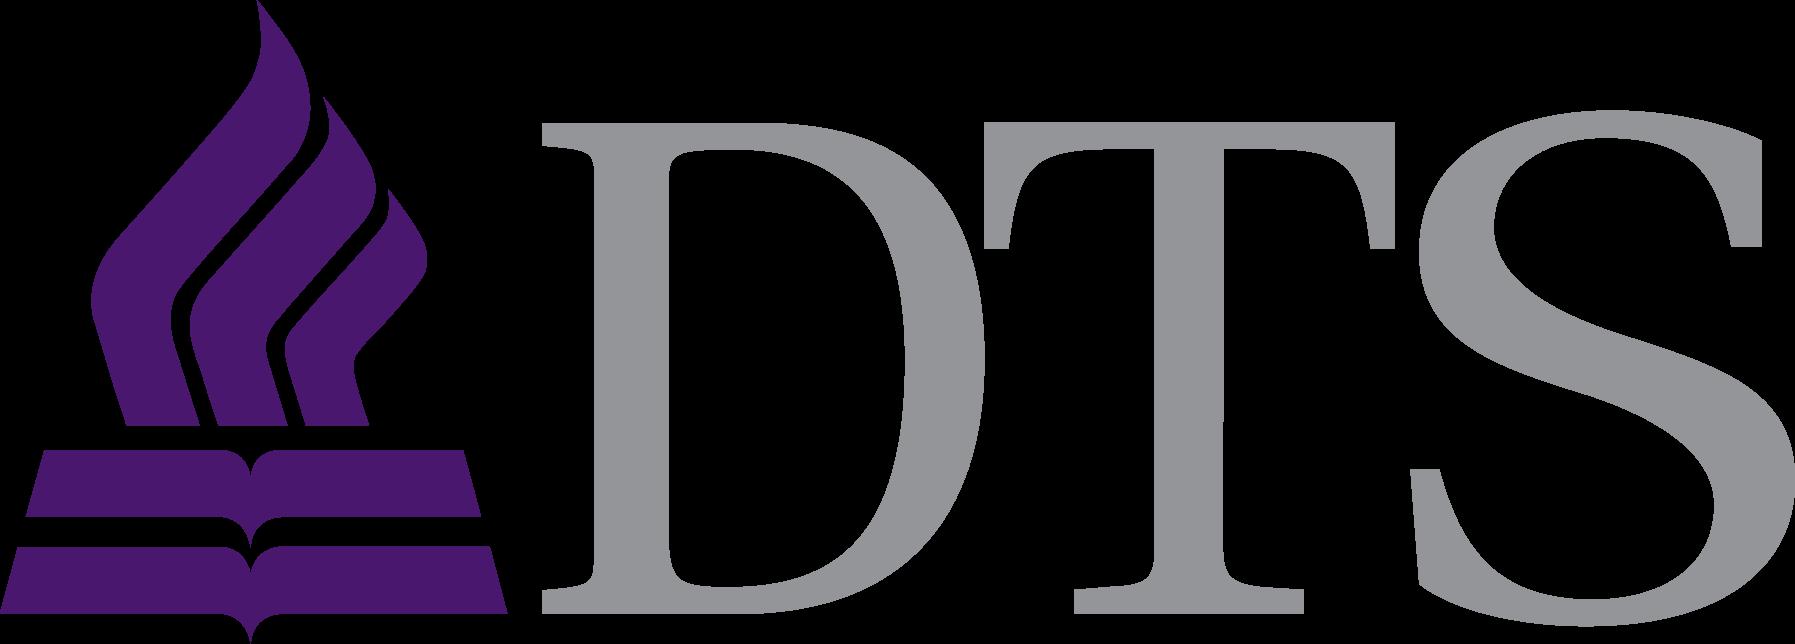 DTS.logo.pms.png